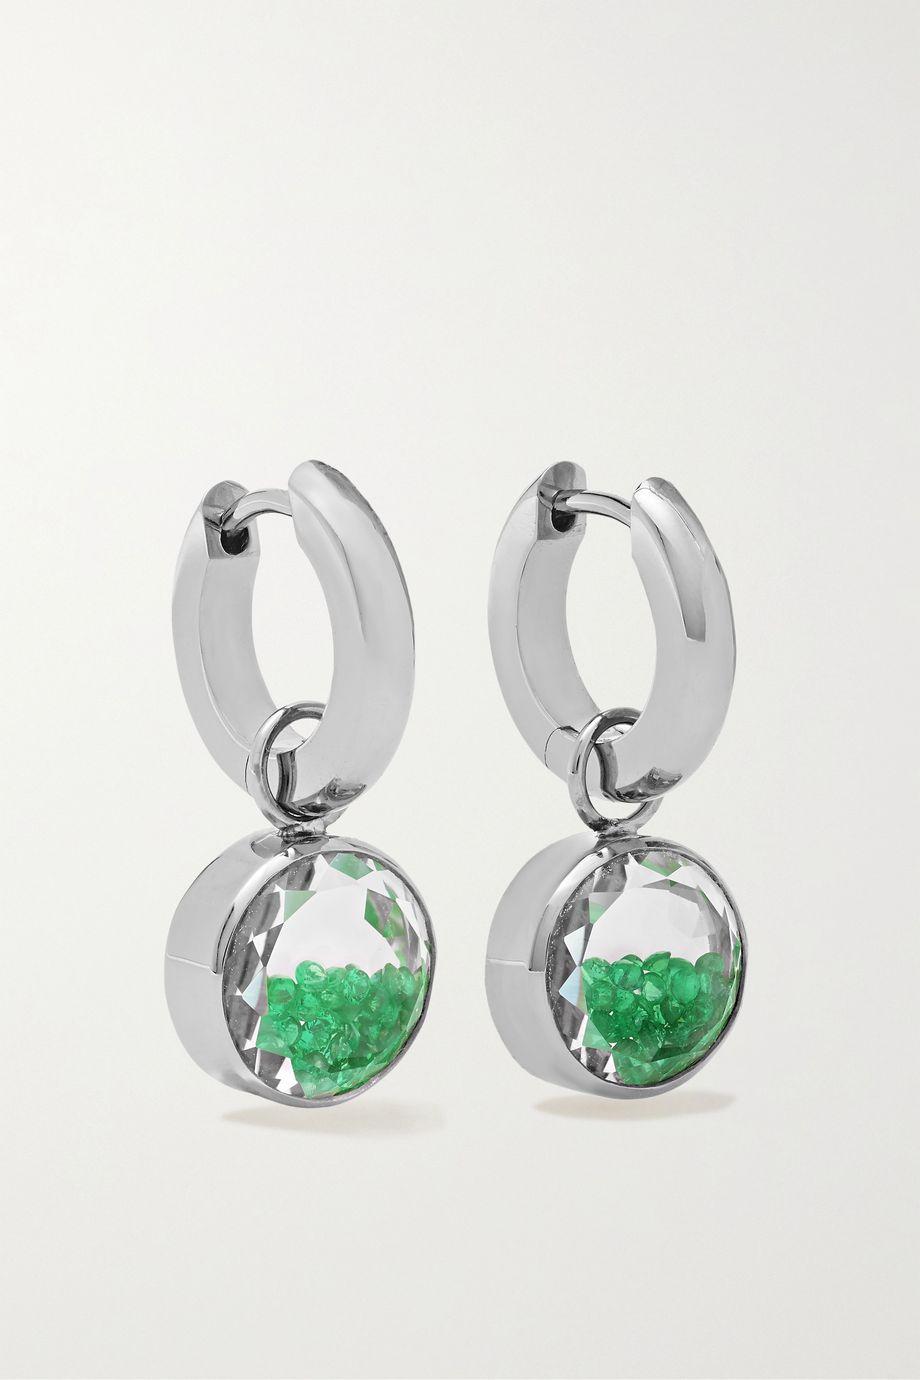 Moritz Glik 18-karat gray gold palladium, sapphire crystal and emerald earrings